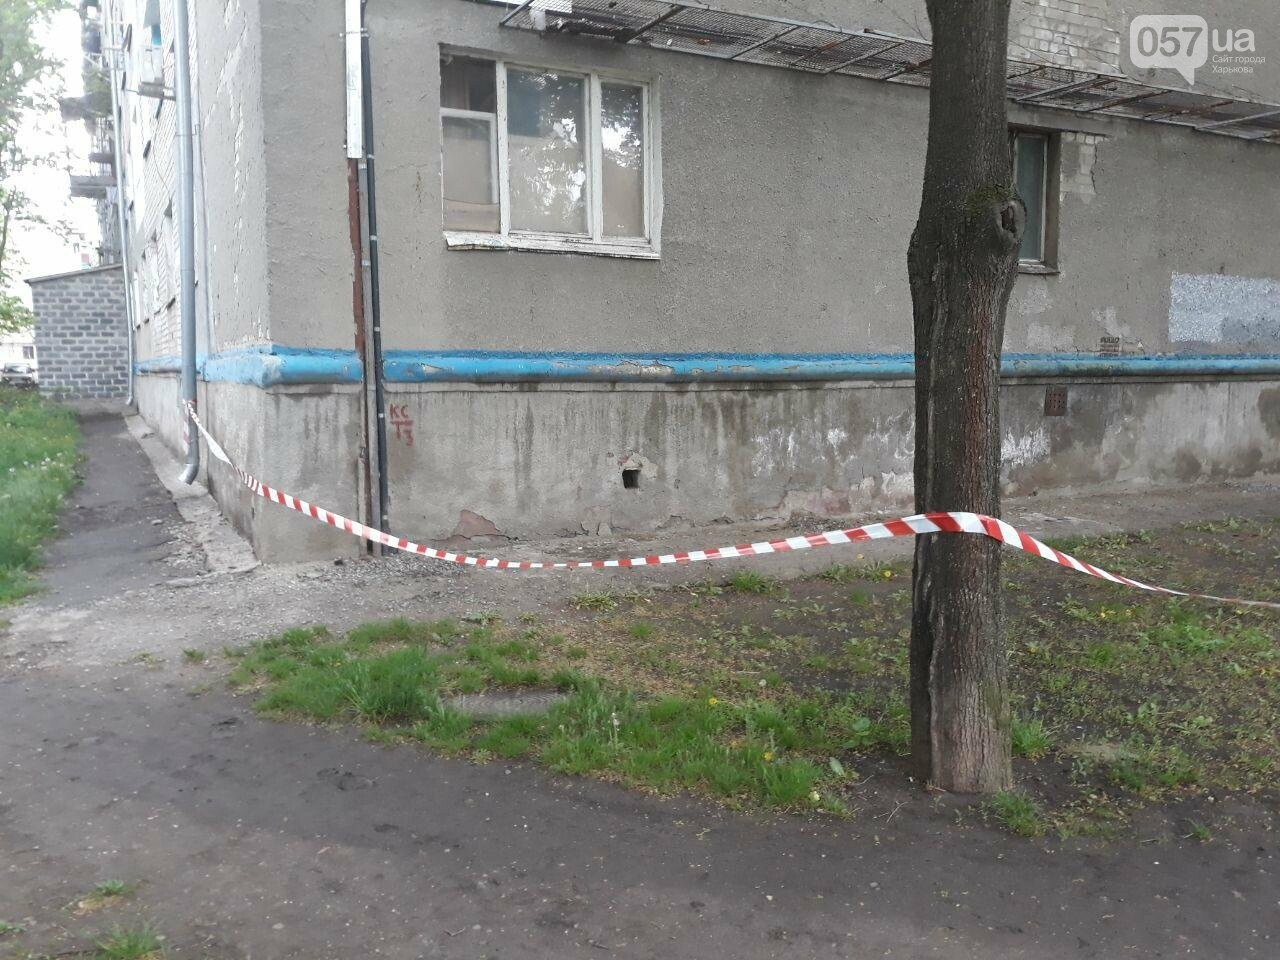 В Харькове силовики оцепили «пятиэтажку» и искали взрывчатку, - ФОТО, фото-7